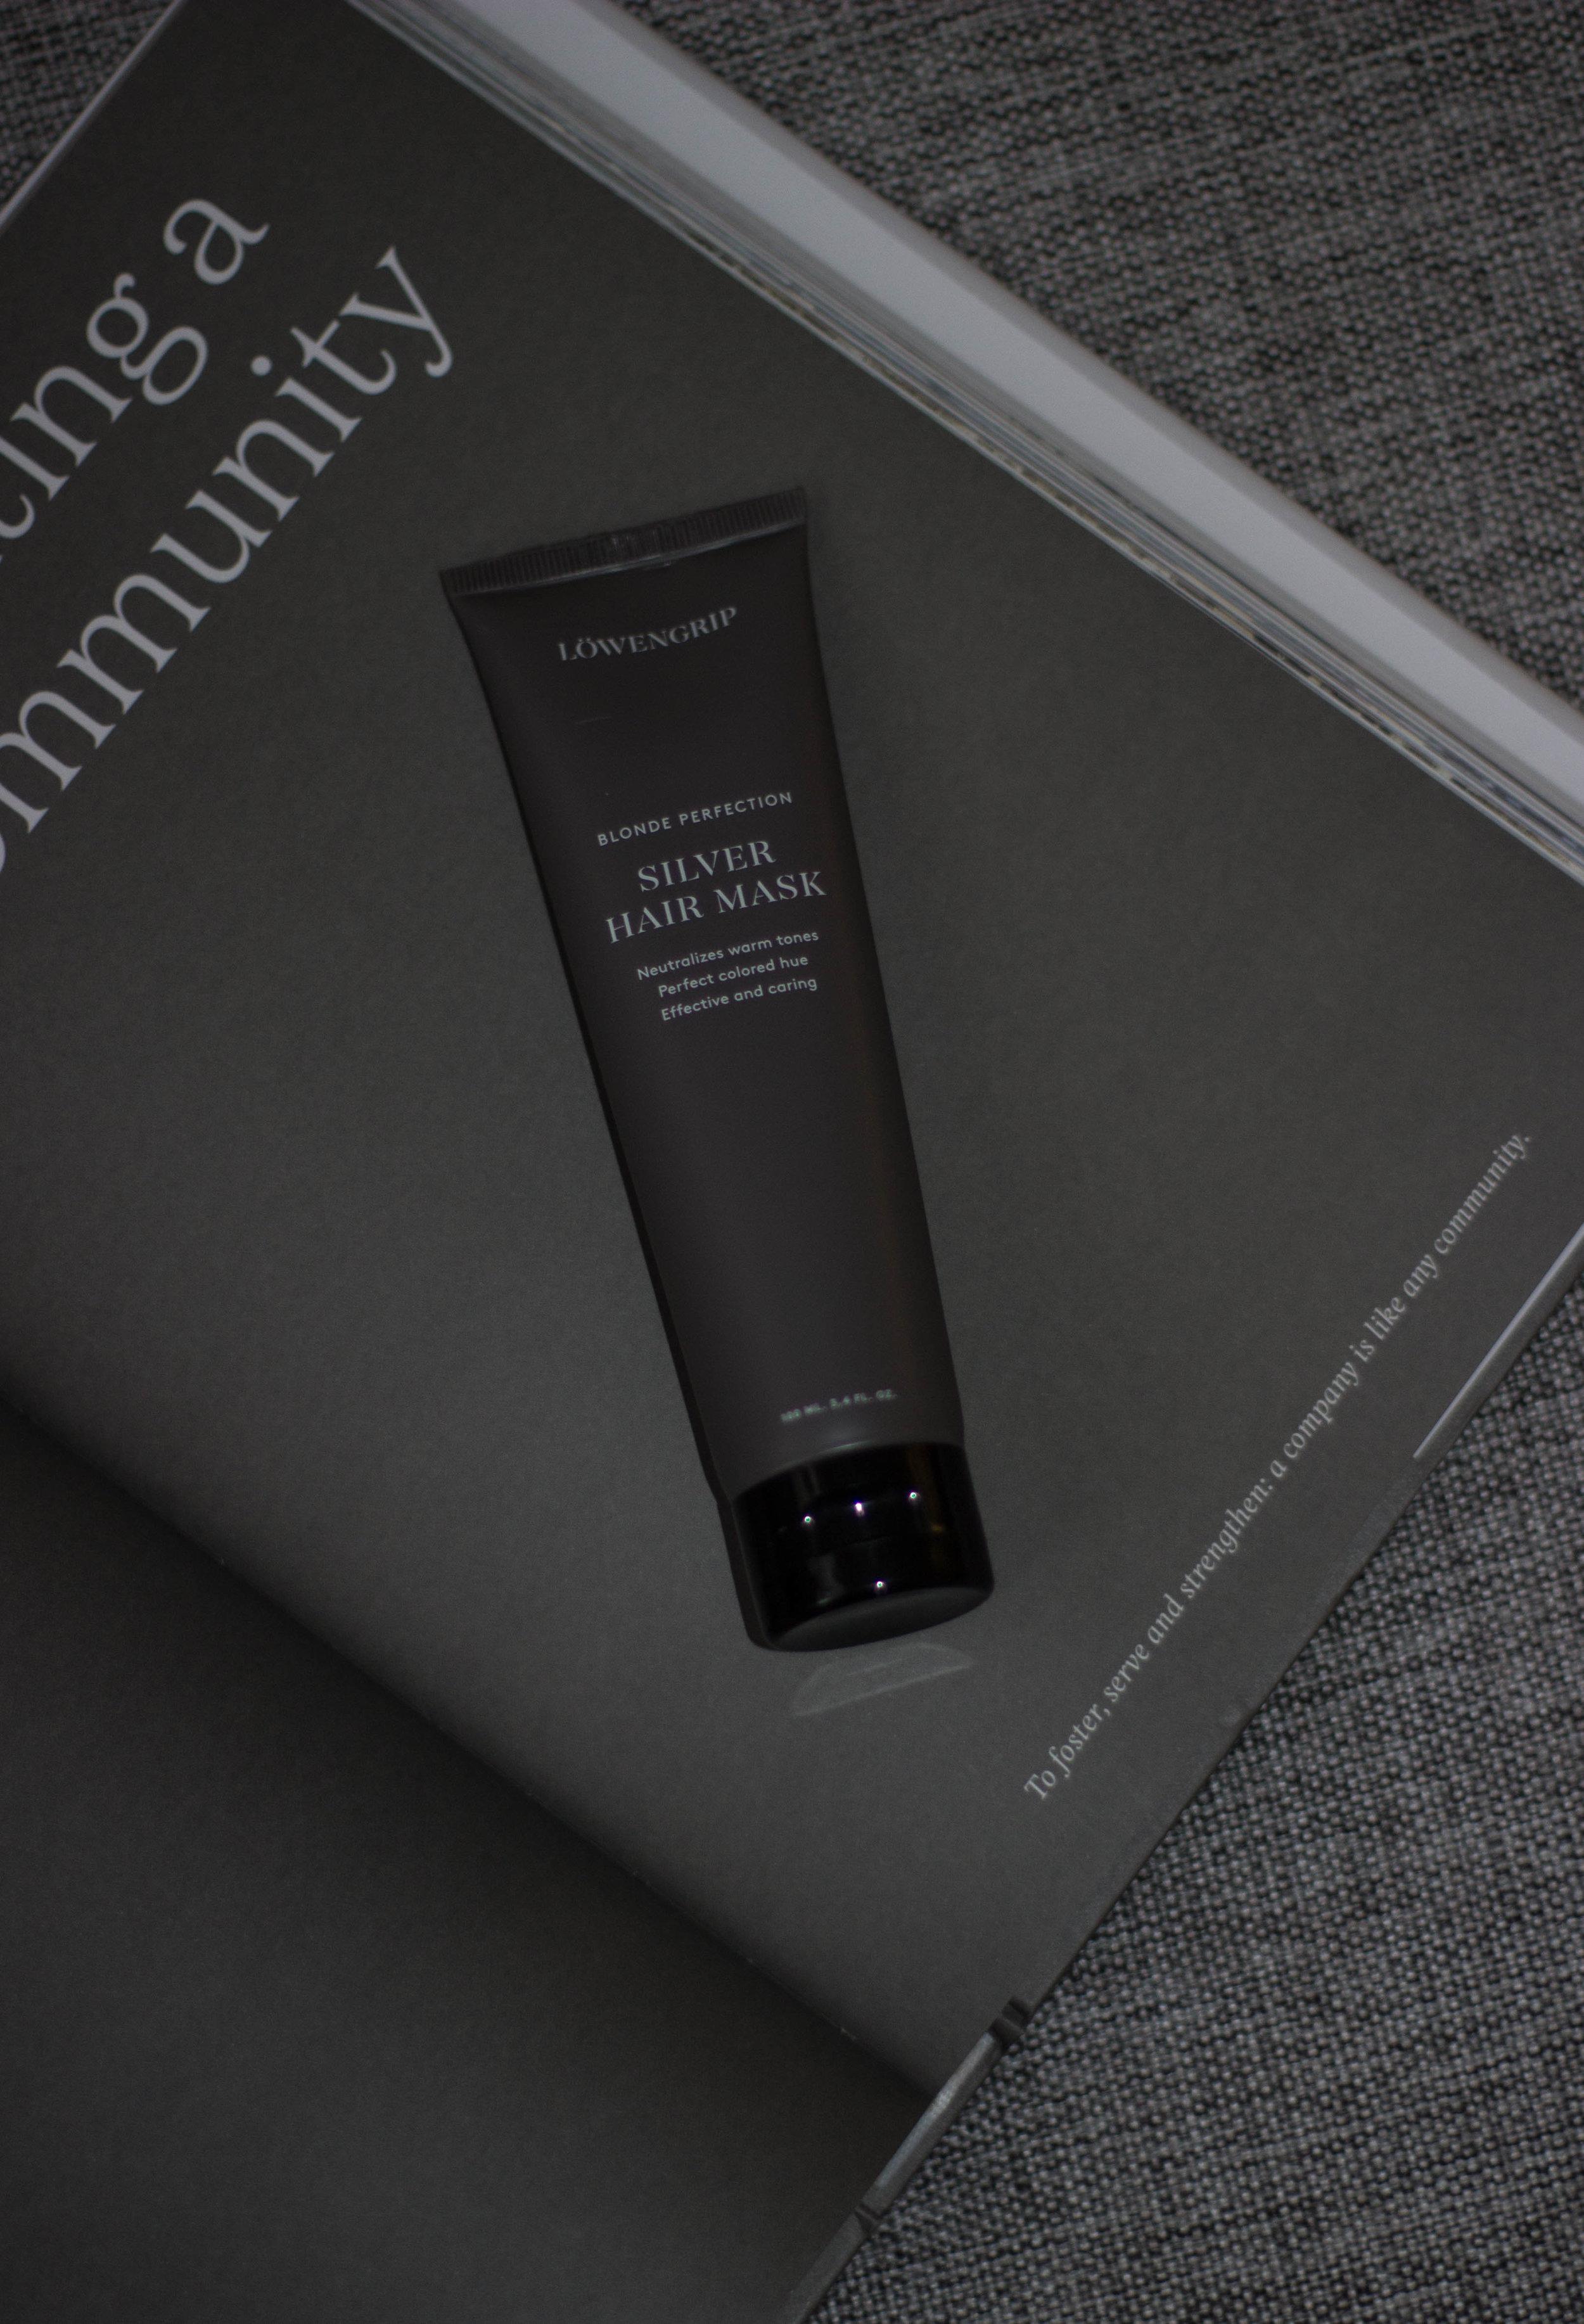 löwengrip_lowengrip_aboutthatlook_haircare_skincare_moisture_silverhairmask